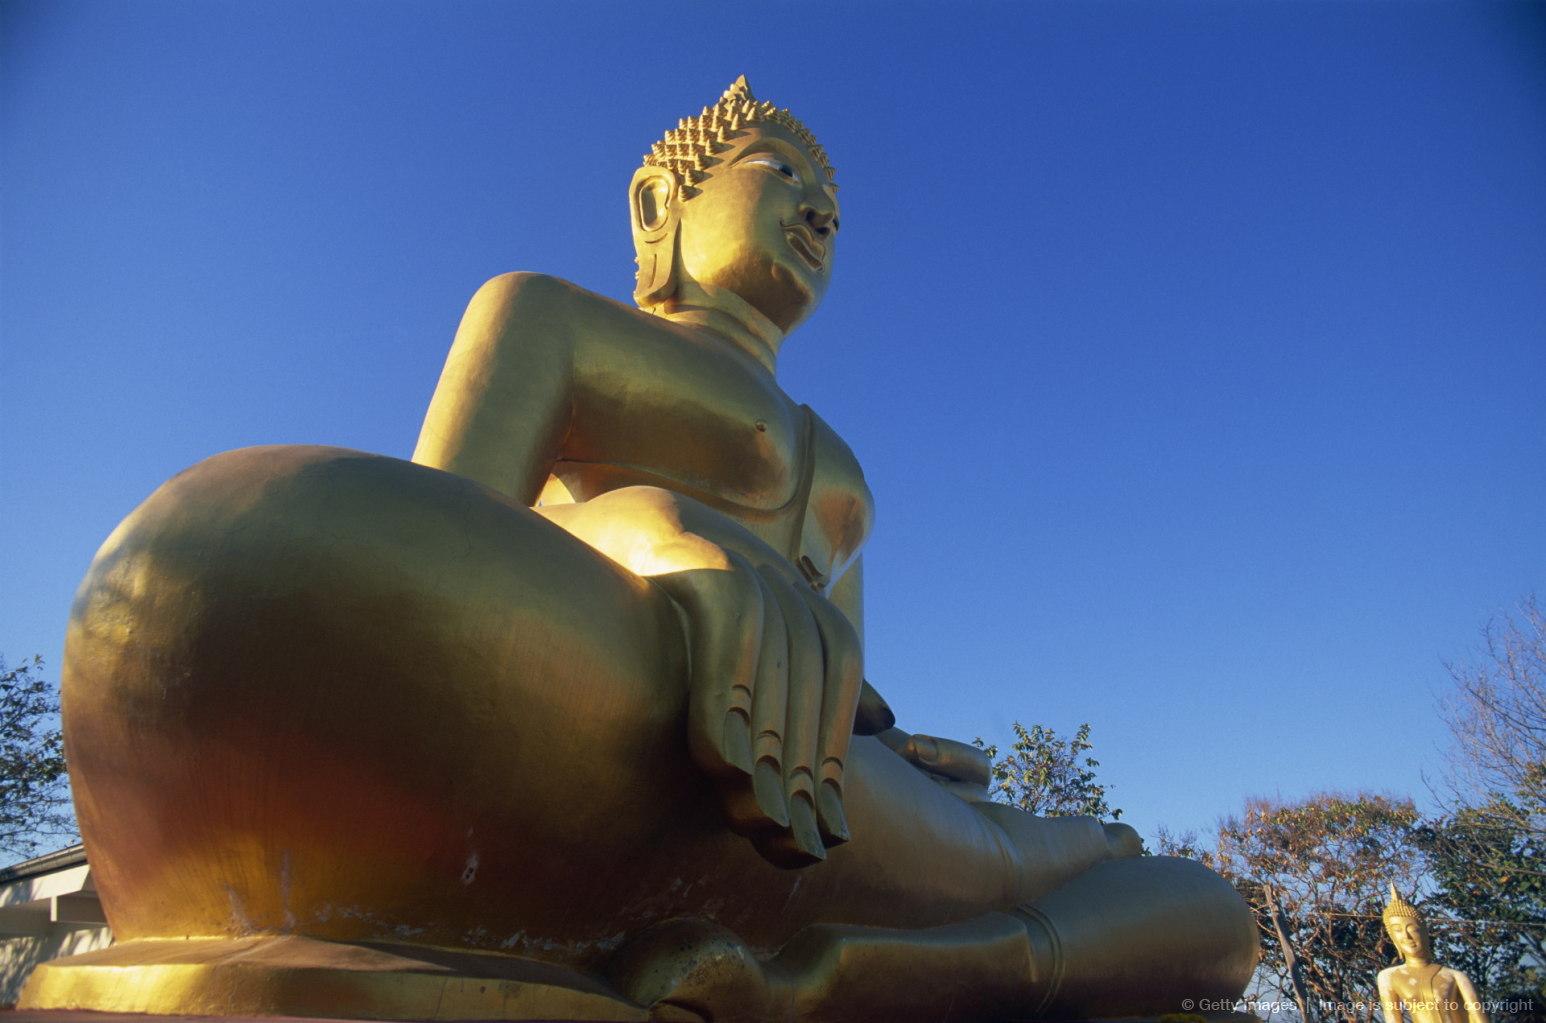 Big Buddha statue, Pattaya, Thailand, Southeast Asia, Asia